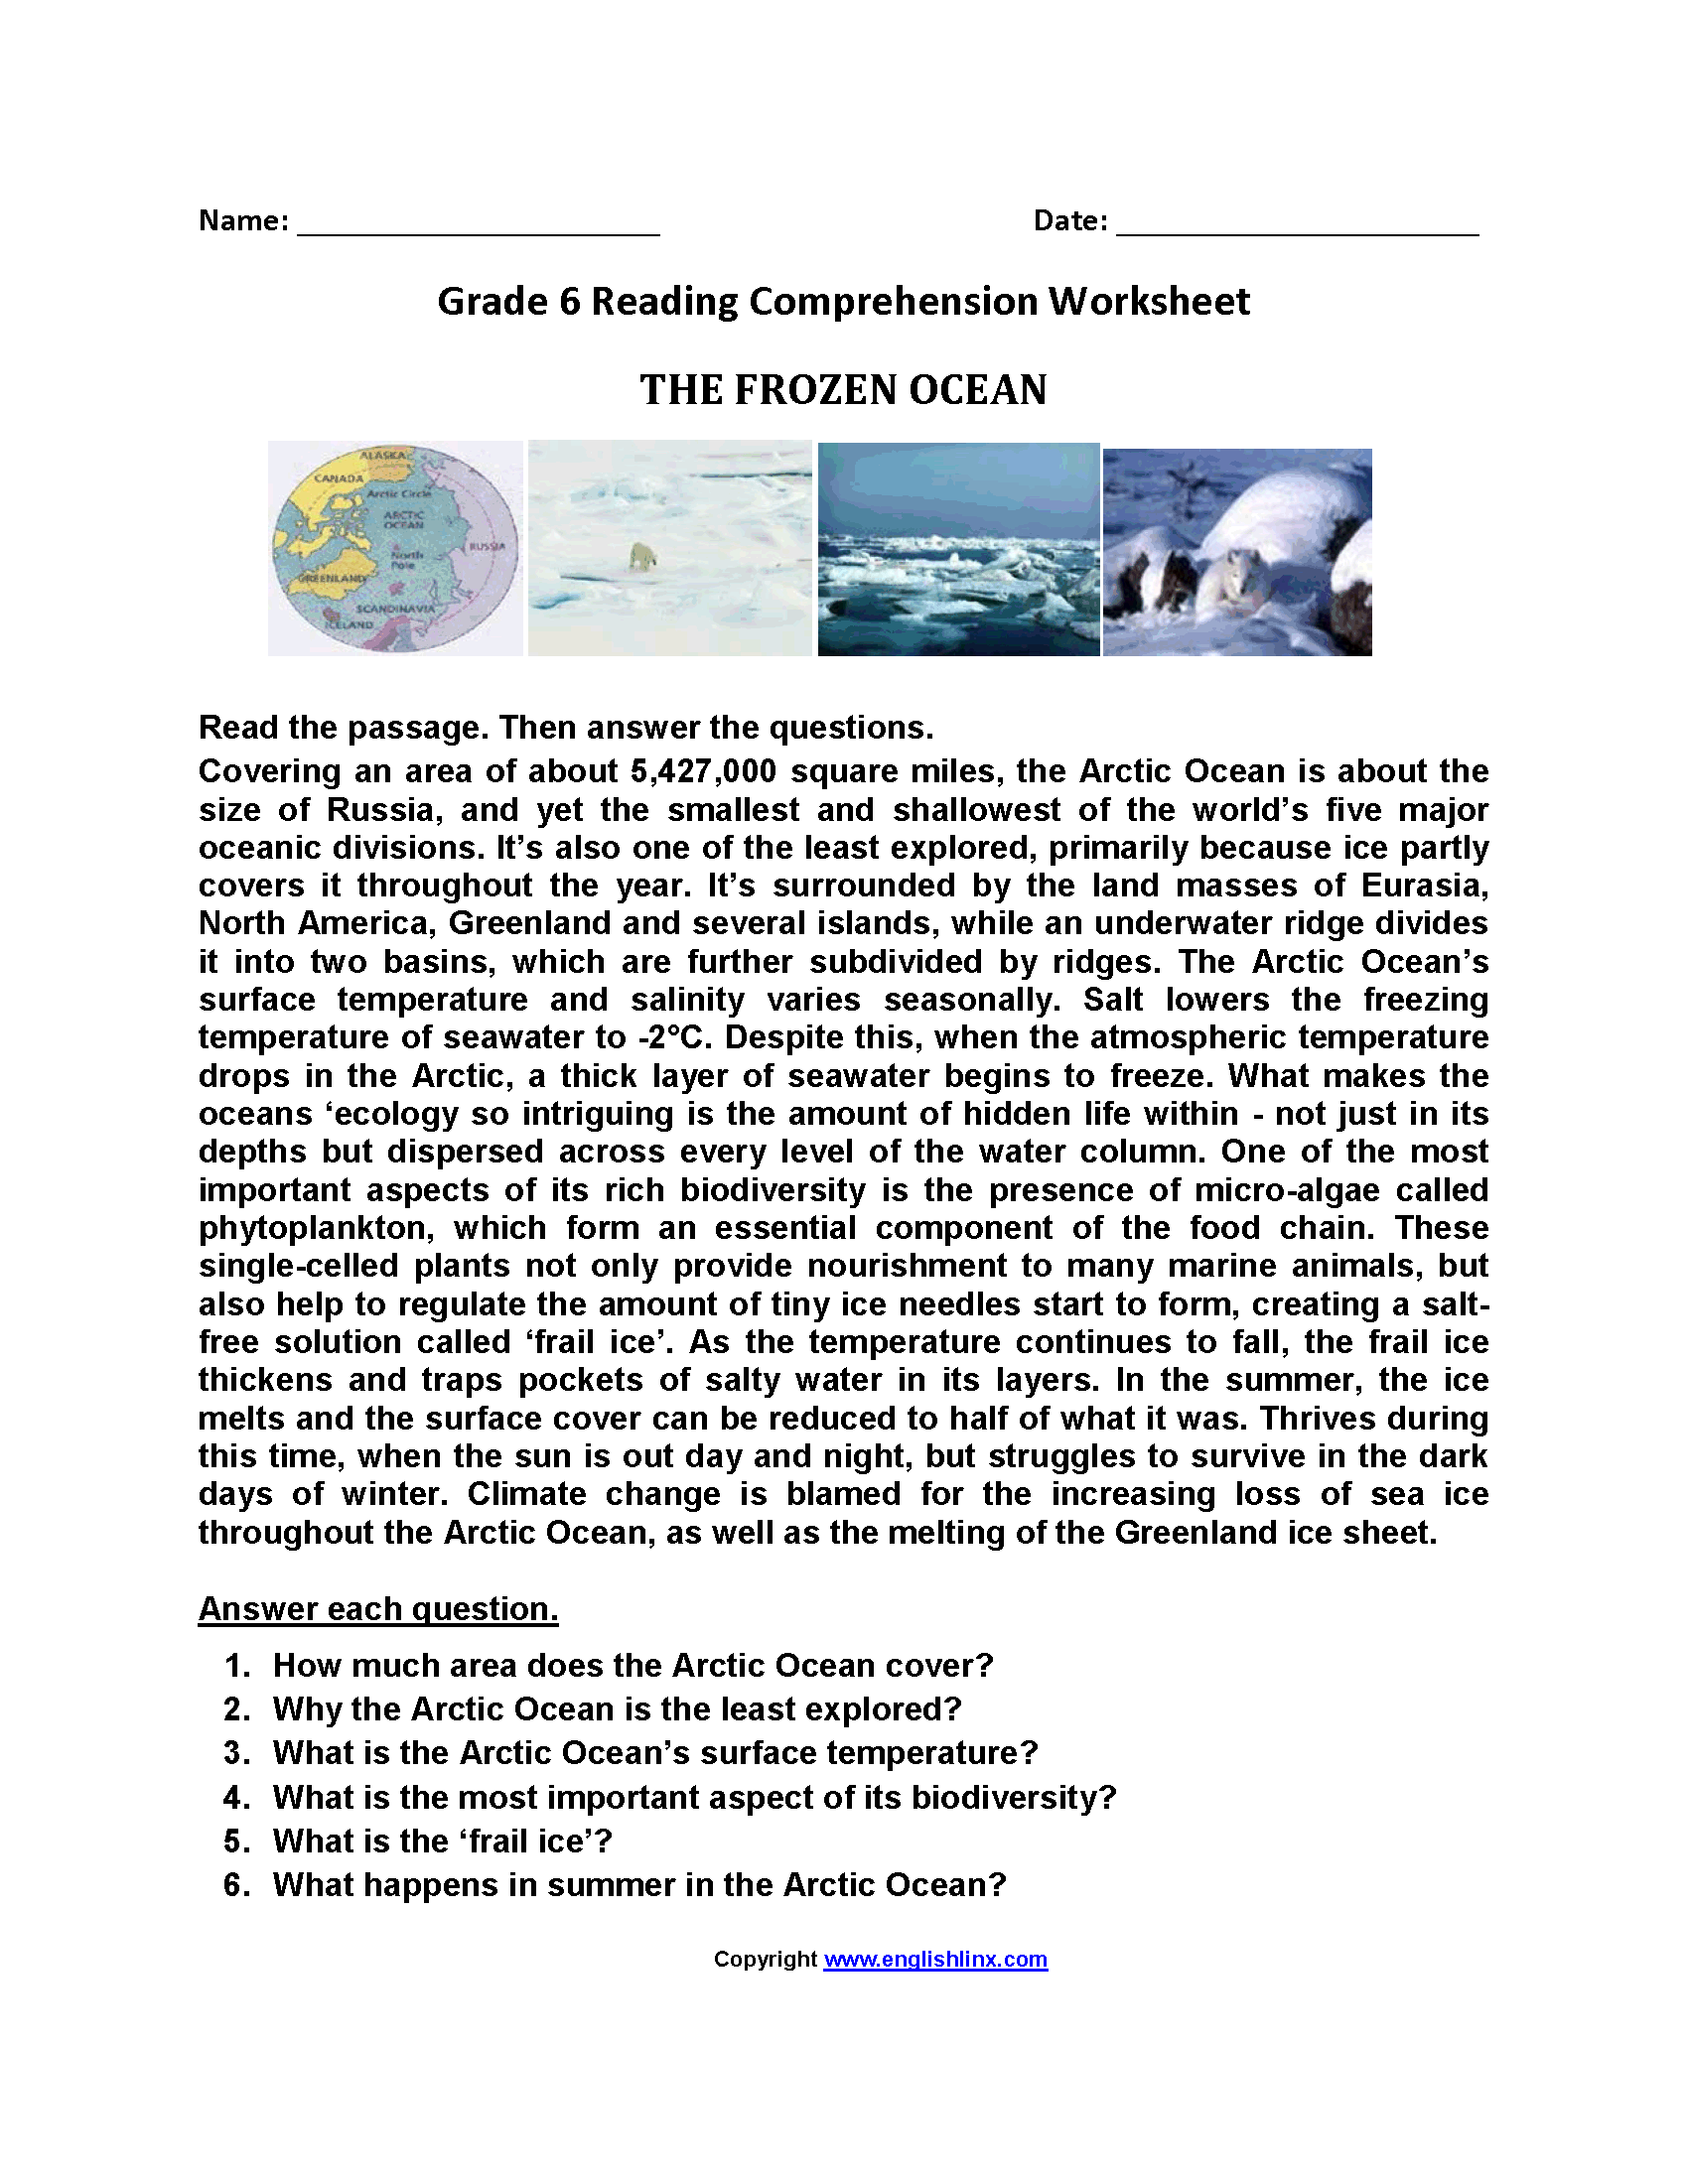 The Frozen Ocean Br Sixth Grade Reading Worksheets Reading Comprehension Worksheets Reading Worksheets Reading Comprehension Passages [ 2200 x 1700 Pixel ]